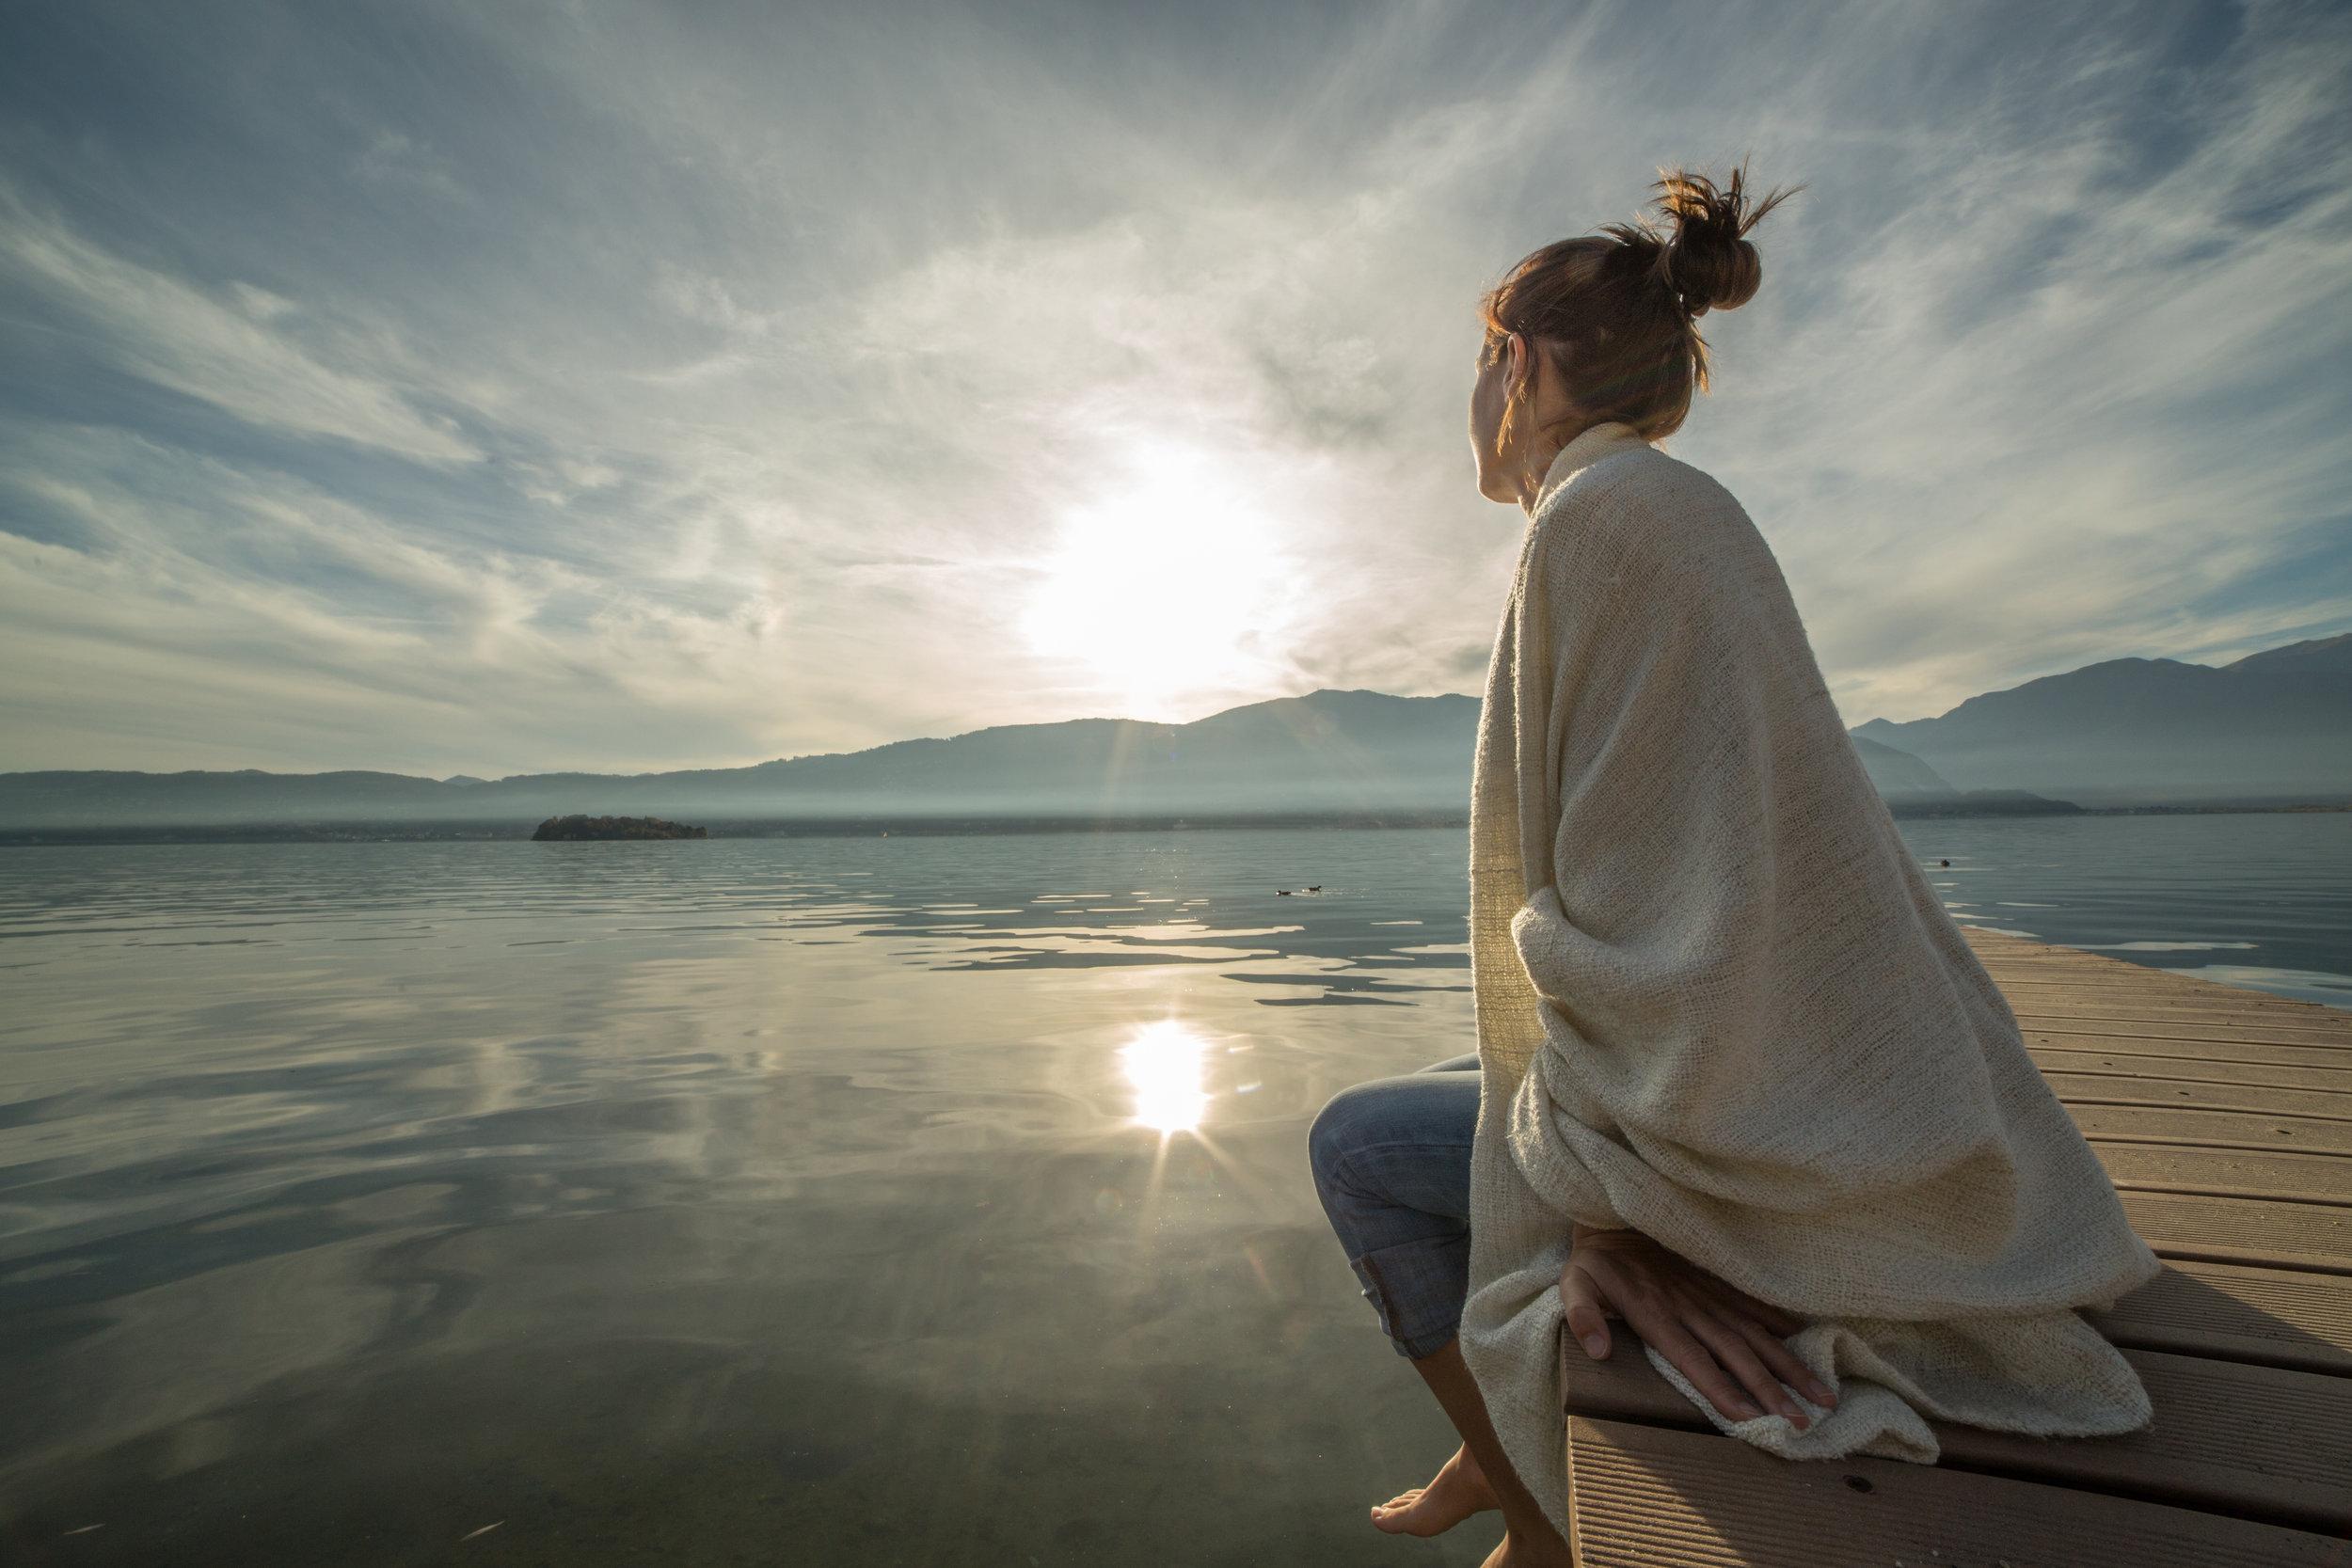 September's Upcoming Daily Calm Meditations